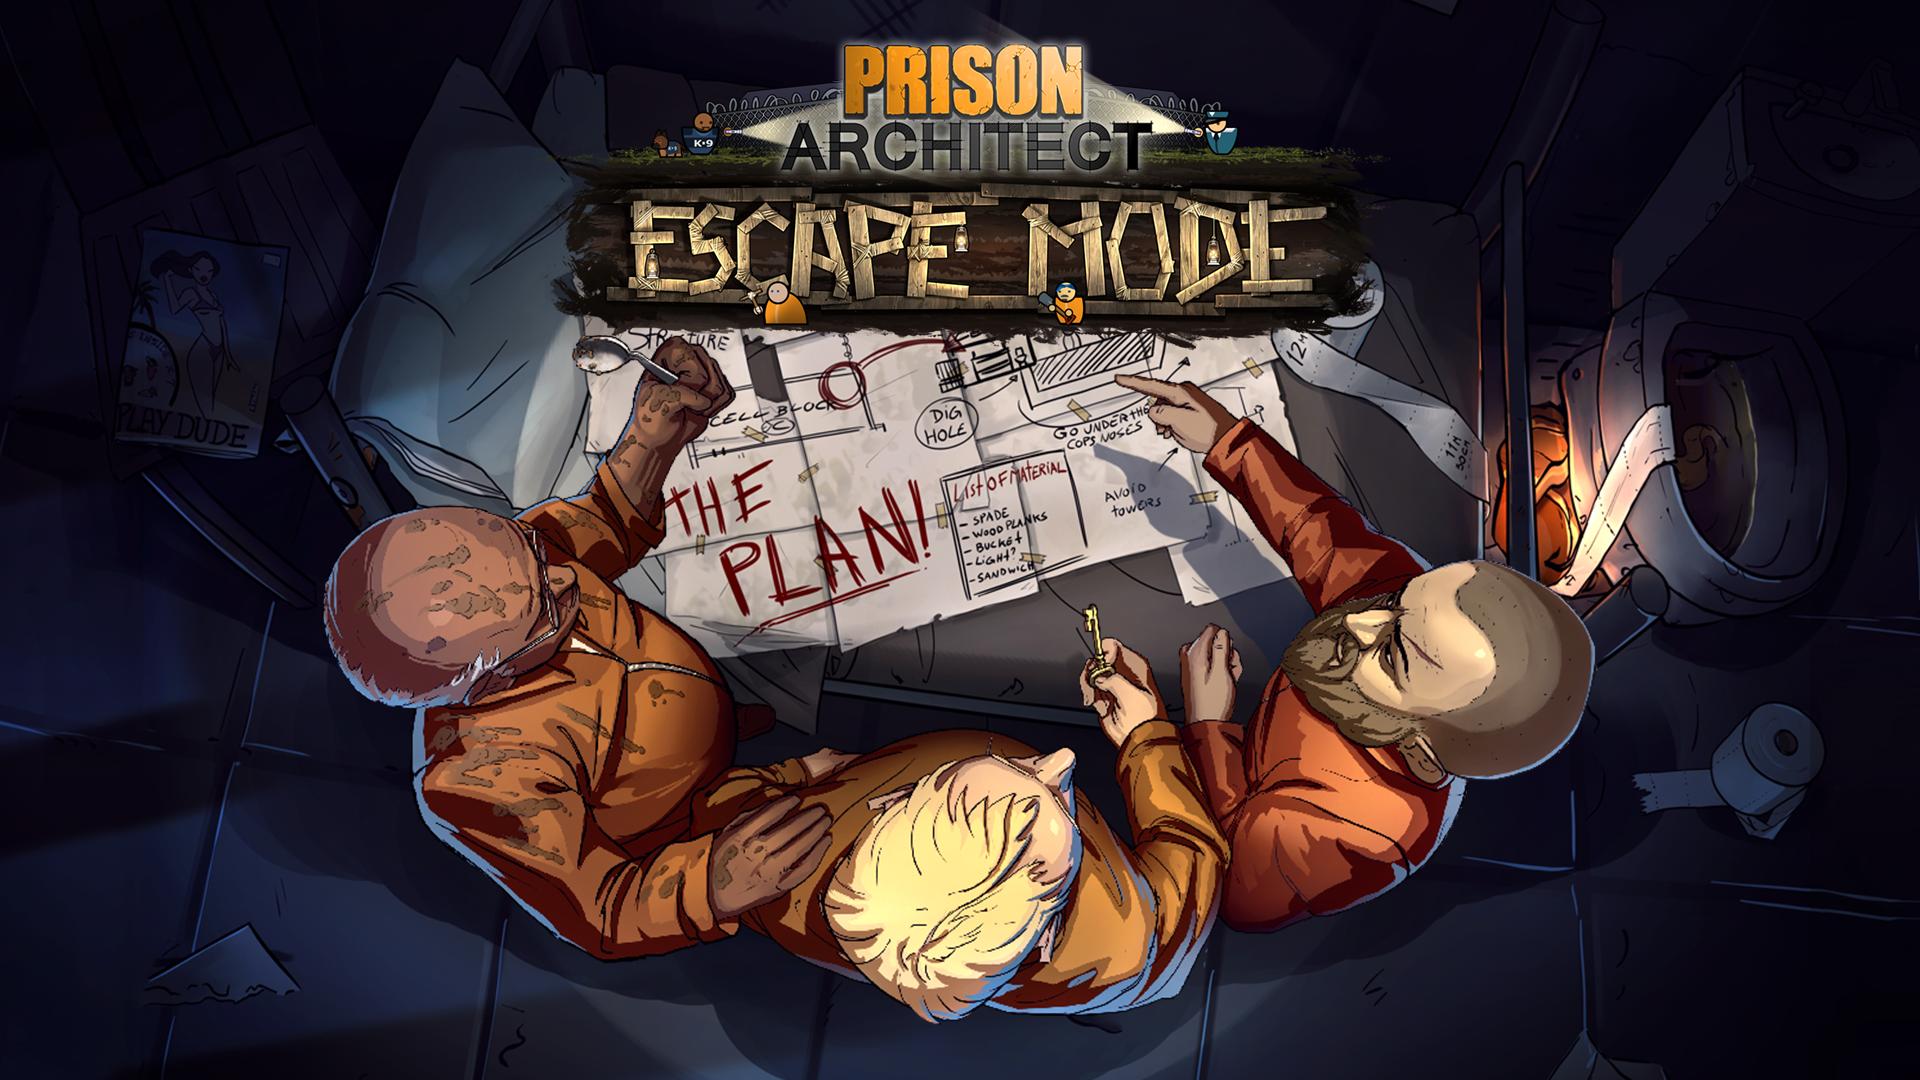 Video For The Great Escape: Prison Architect's Popular Escape Mode Breaks Free on Xbox One